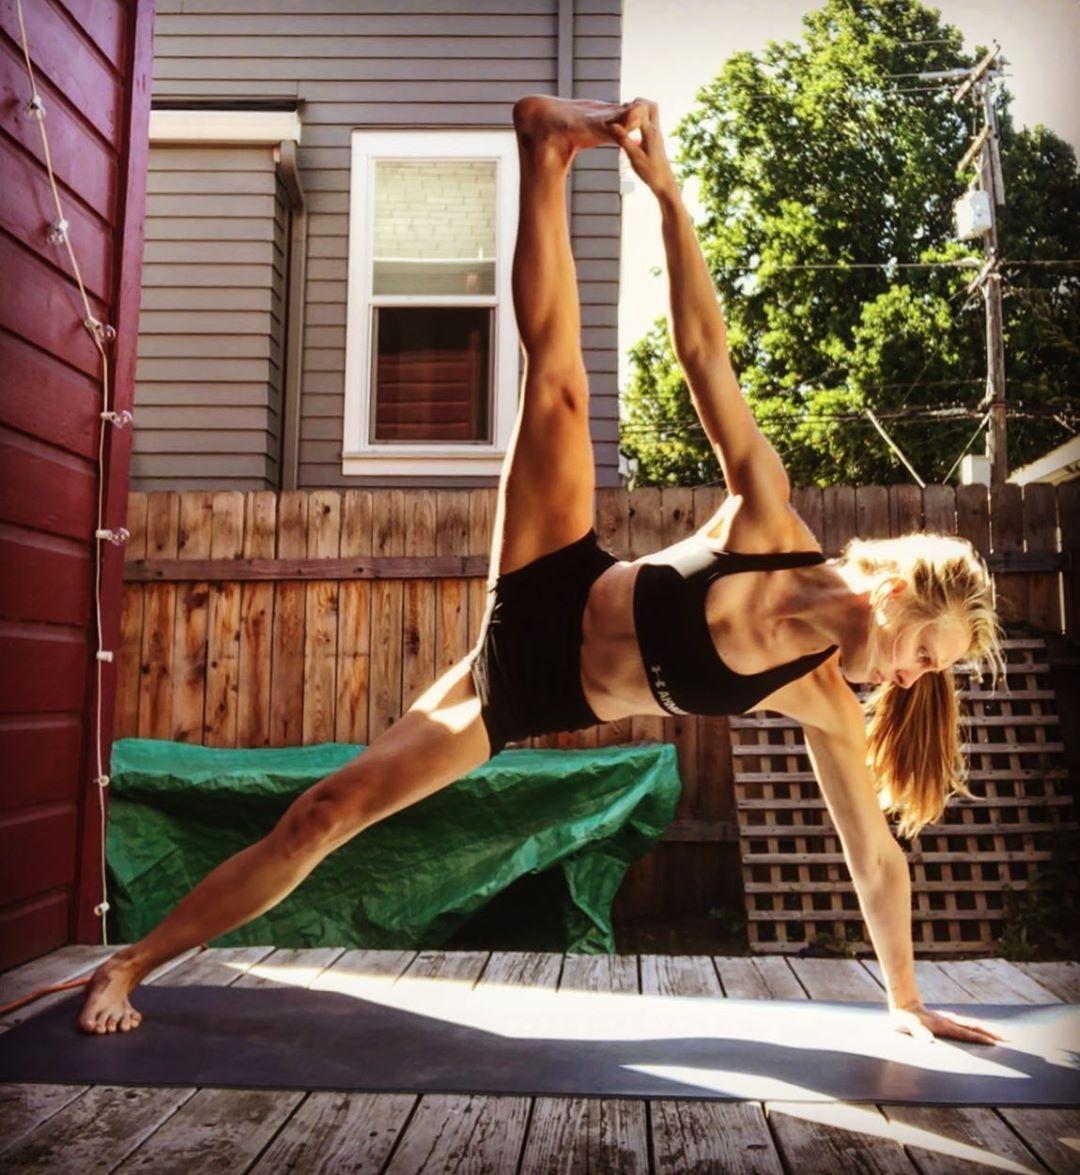 Backyard yoga sessions #yoga #sideplank #toegrab #stretch #practice #balance #breath #yogaposes #yog...